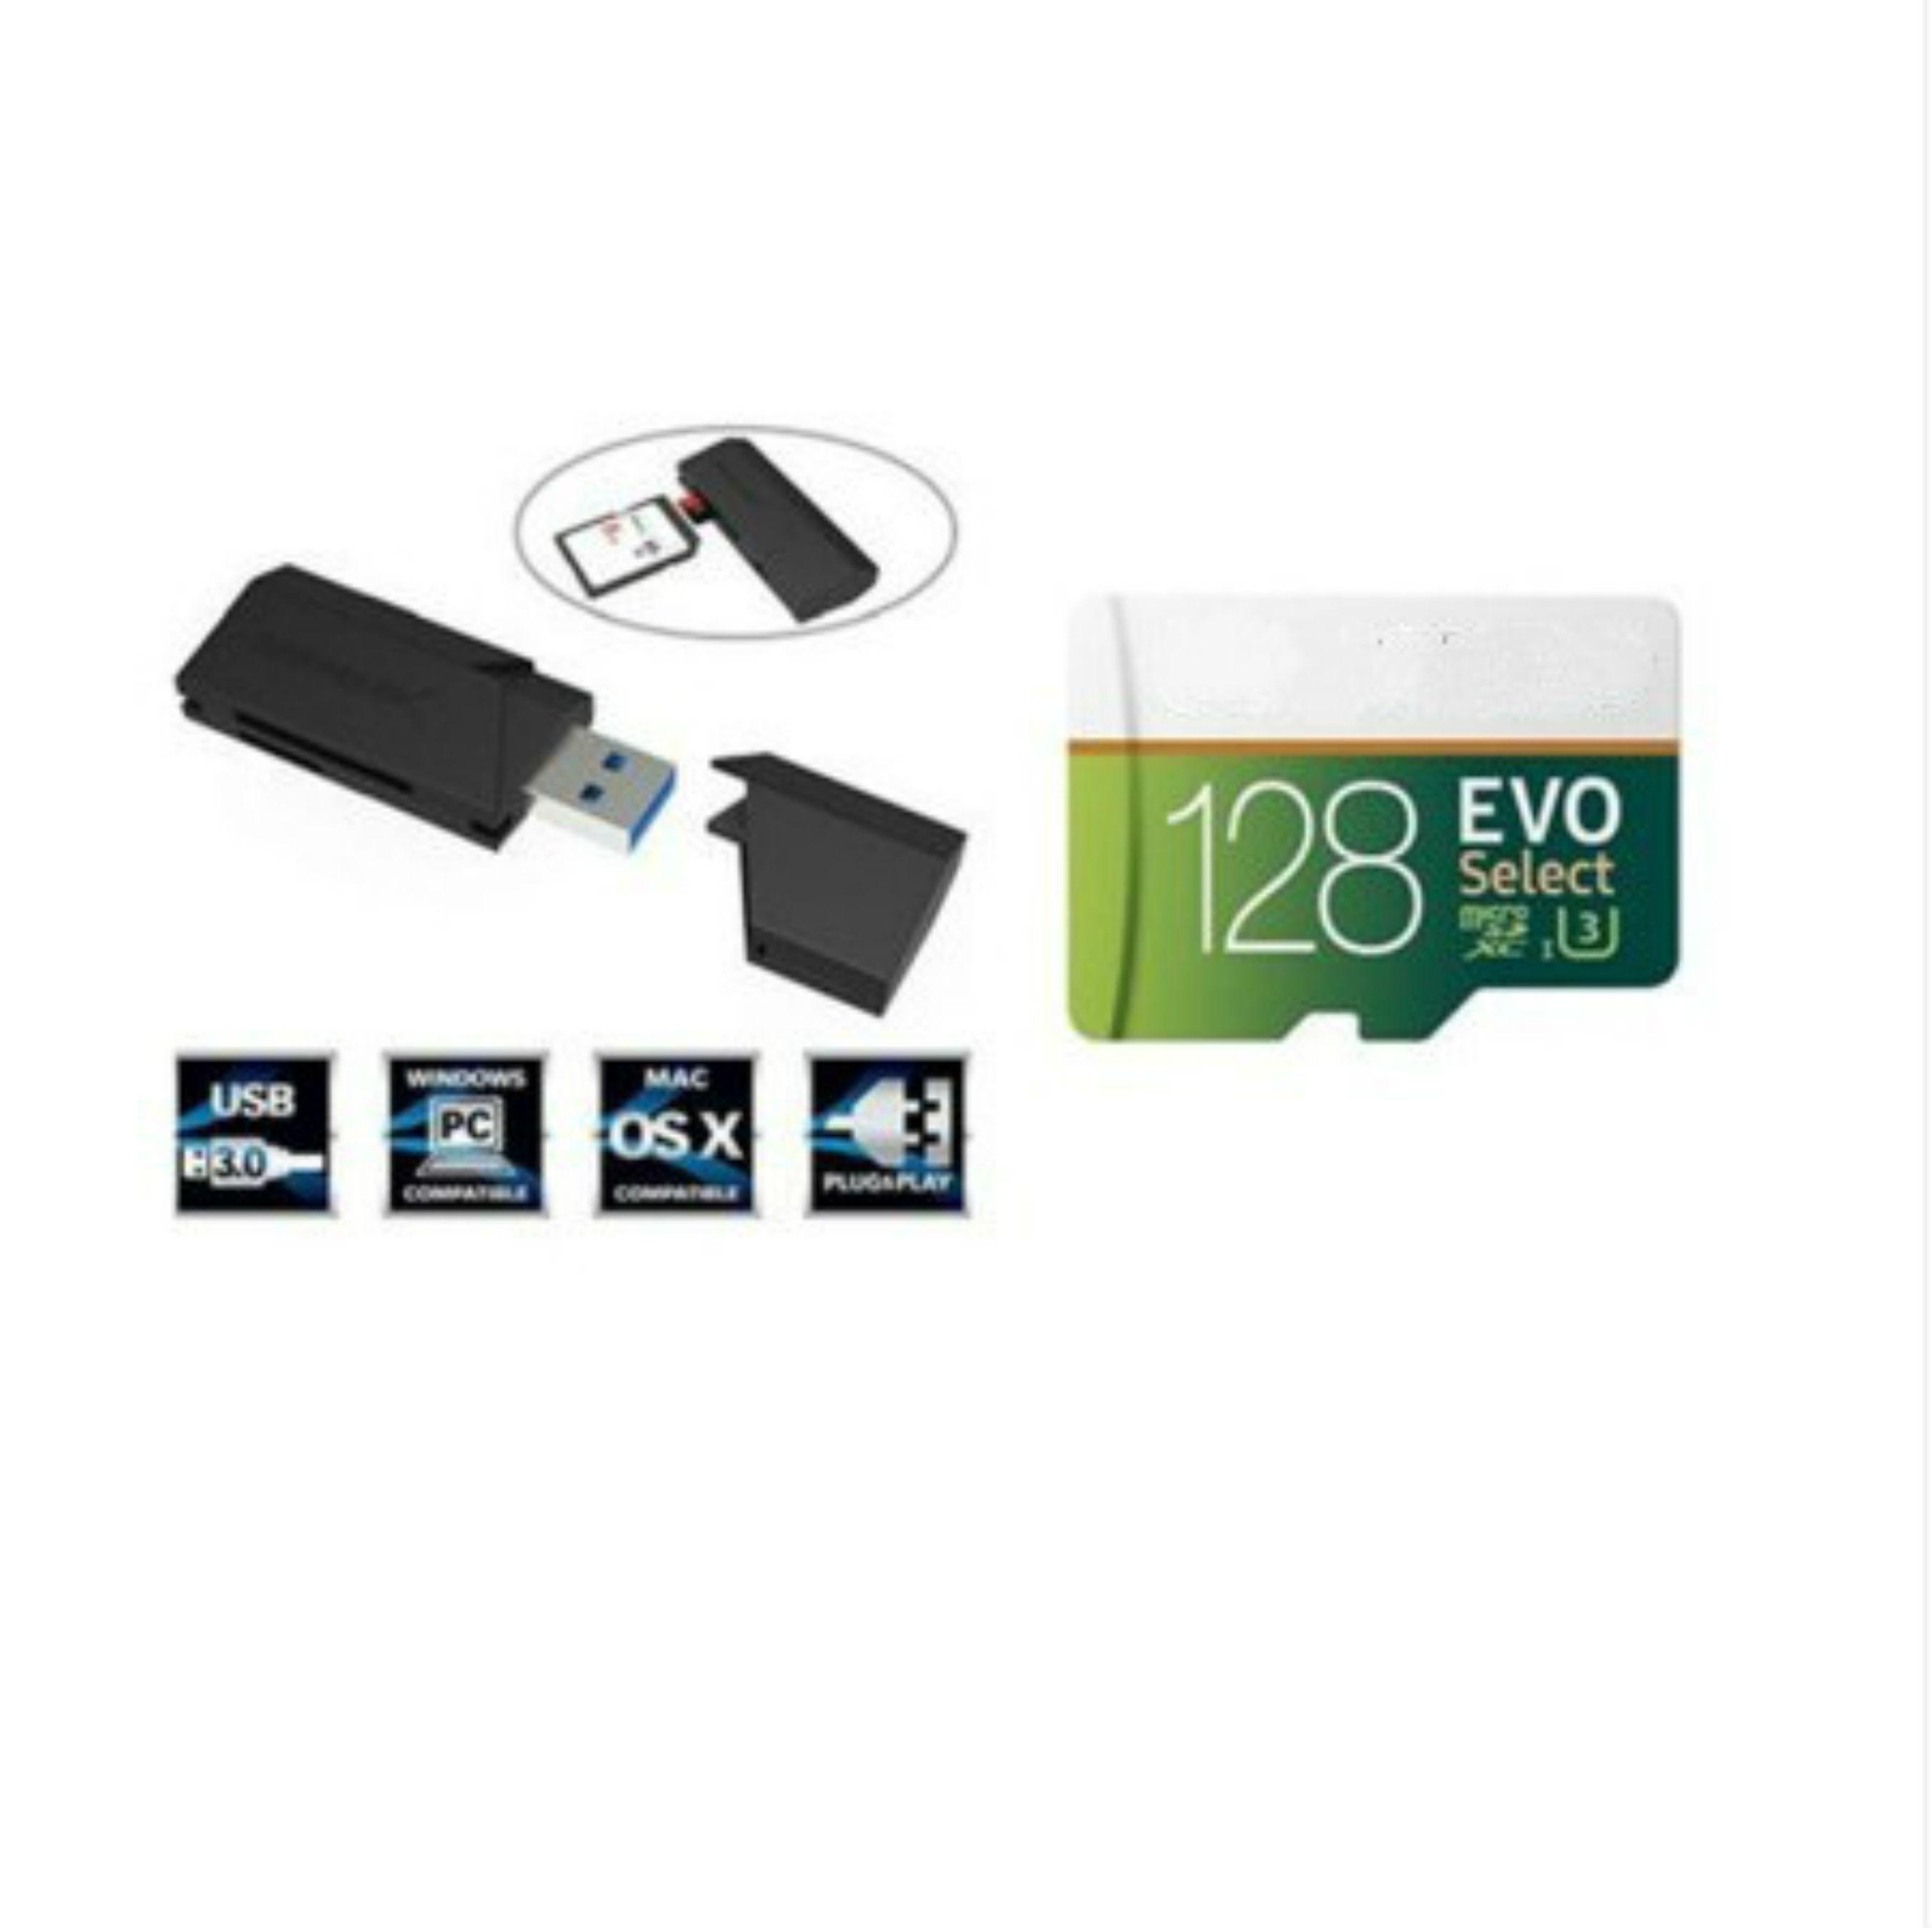 16G / 32GB / 64GB / 128GB / 256GB Samsung EVO Выбрать карту Micro SD / смартфон карту для хранения / карта автомобиля TF Card / SDXC карта памяти 100 МБ